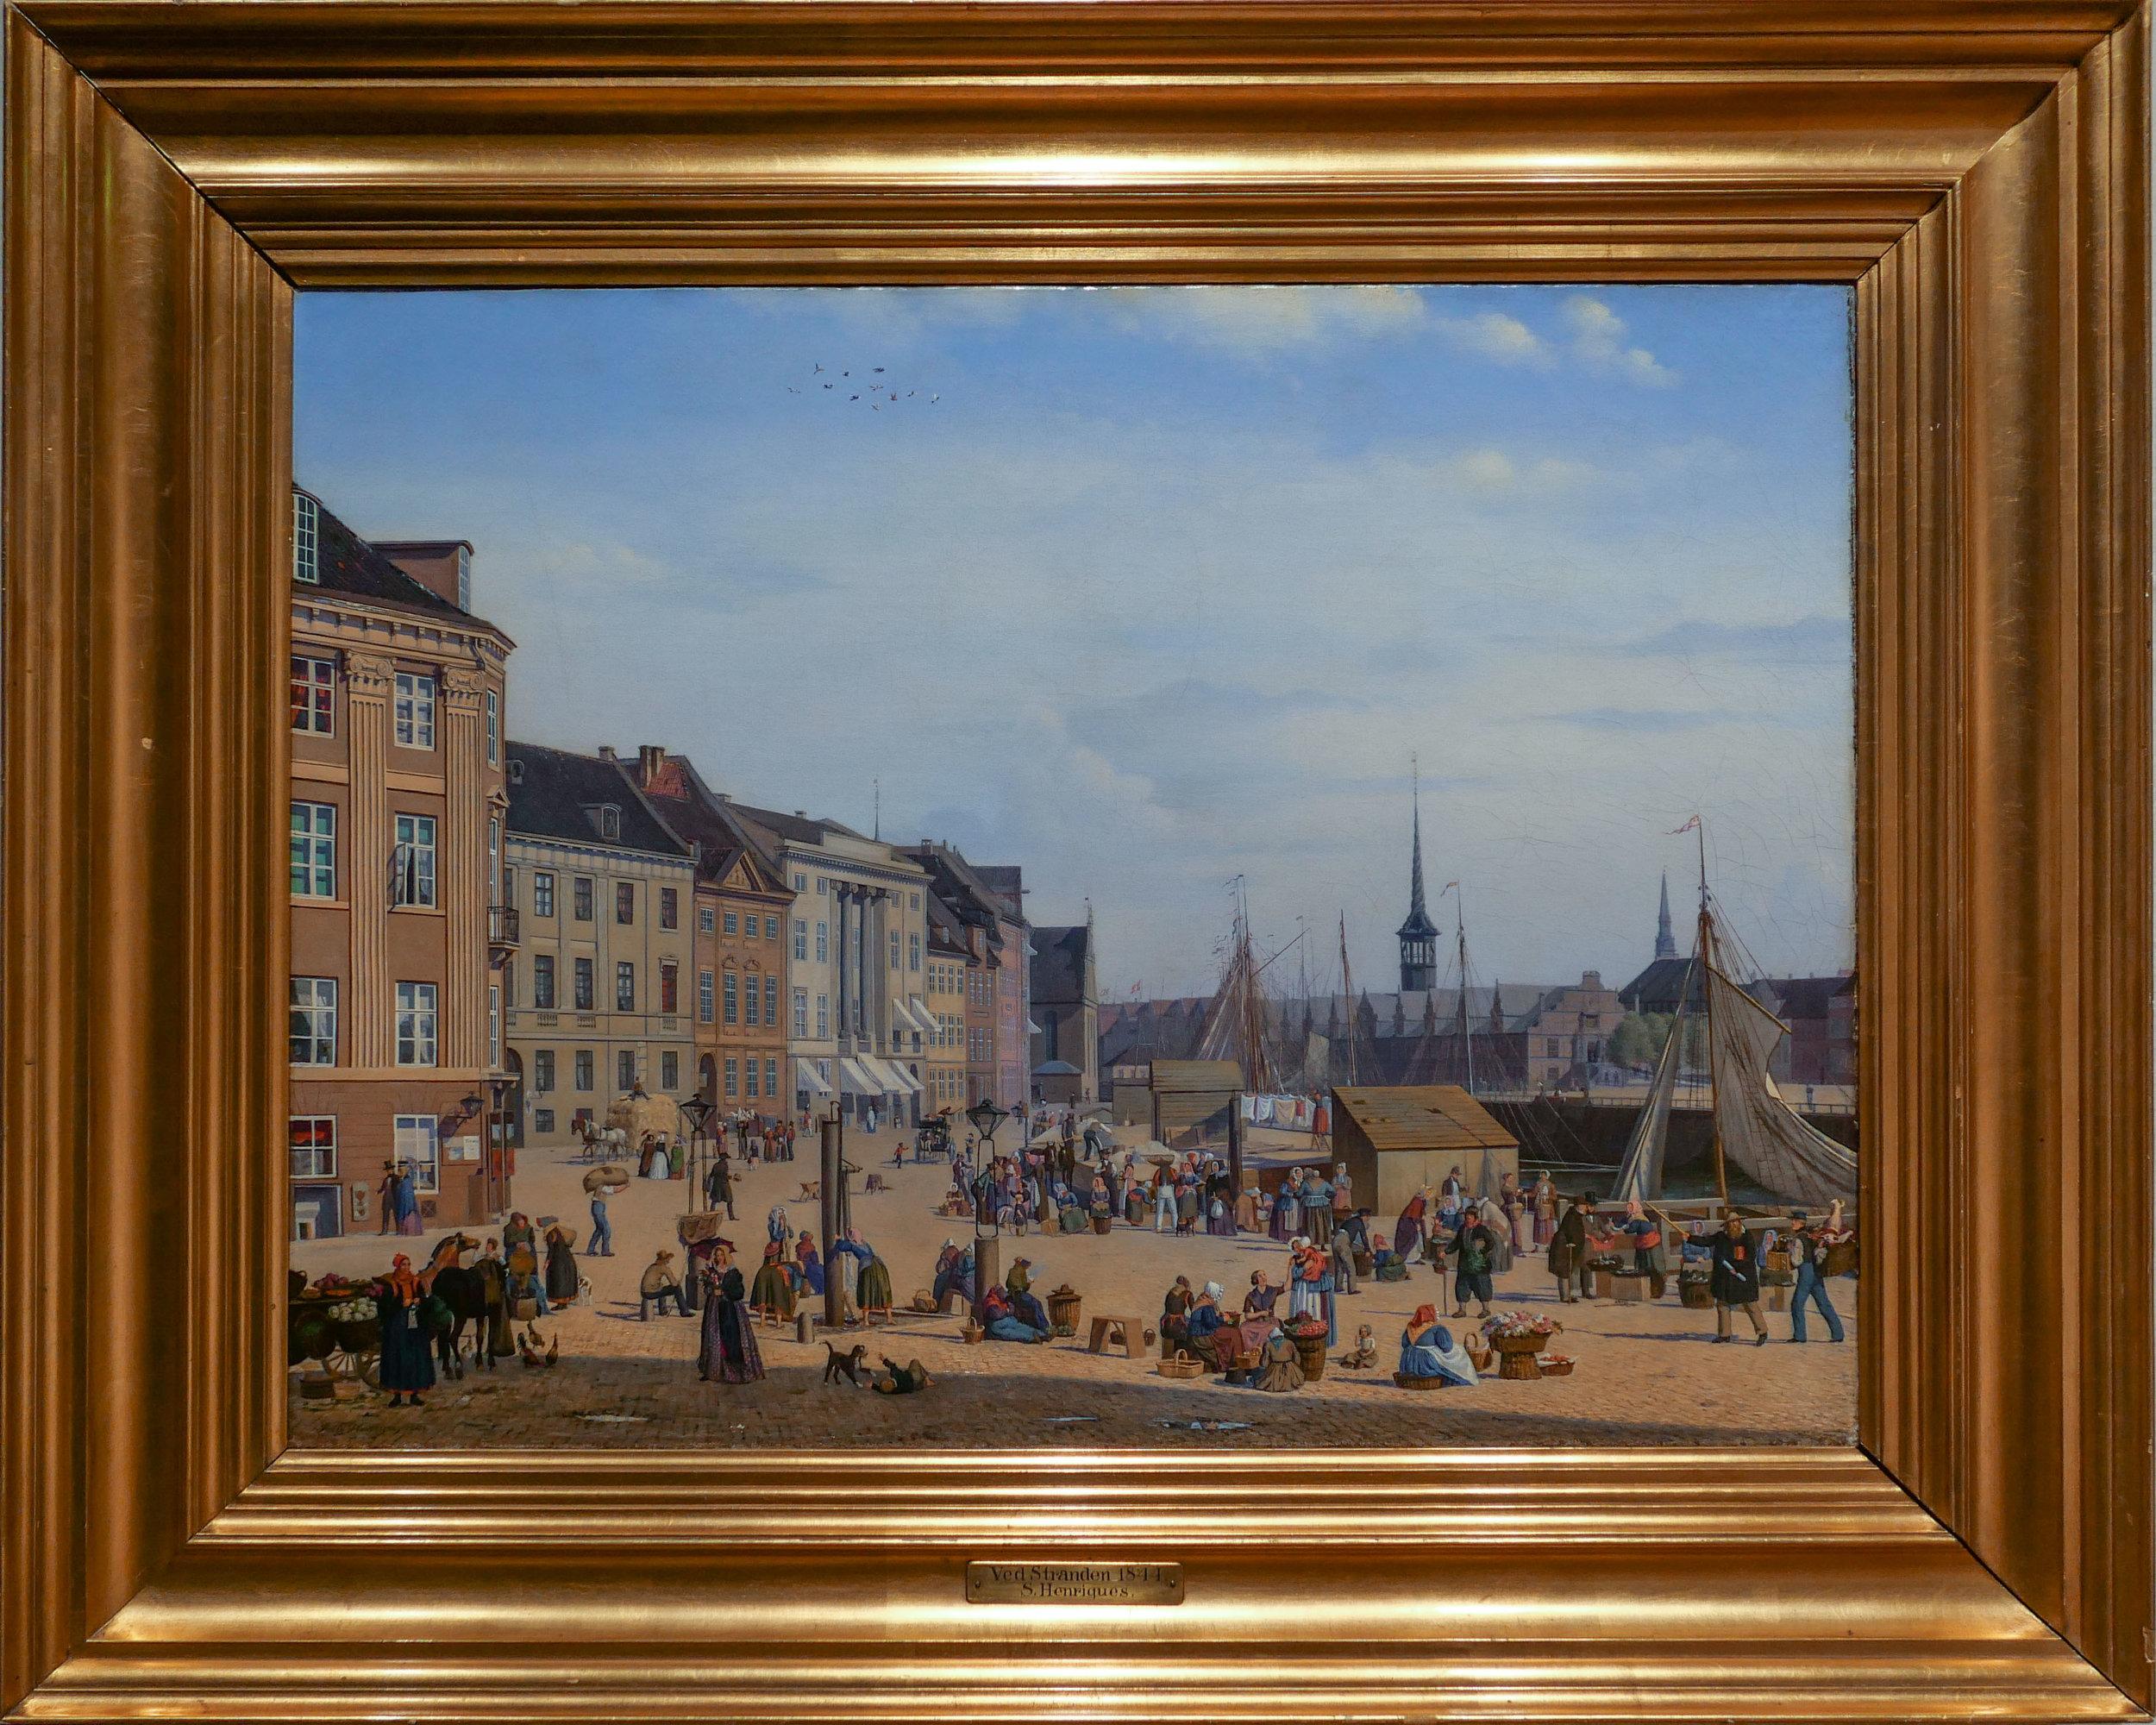 - Højbro Plads in Copenhagen 1844by Sally Henriques (1815-1866)